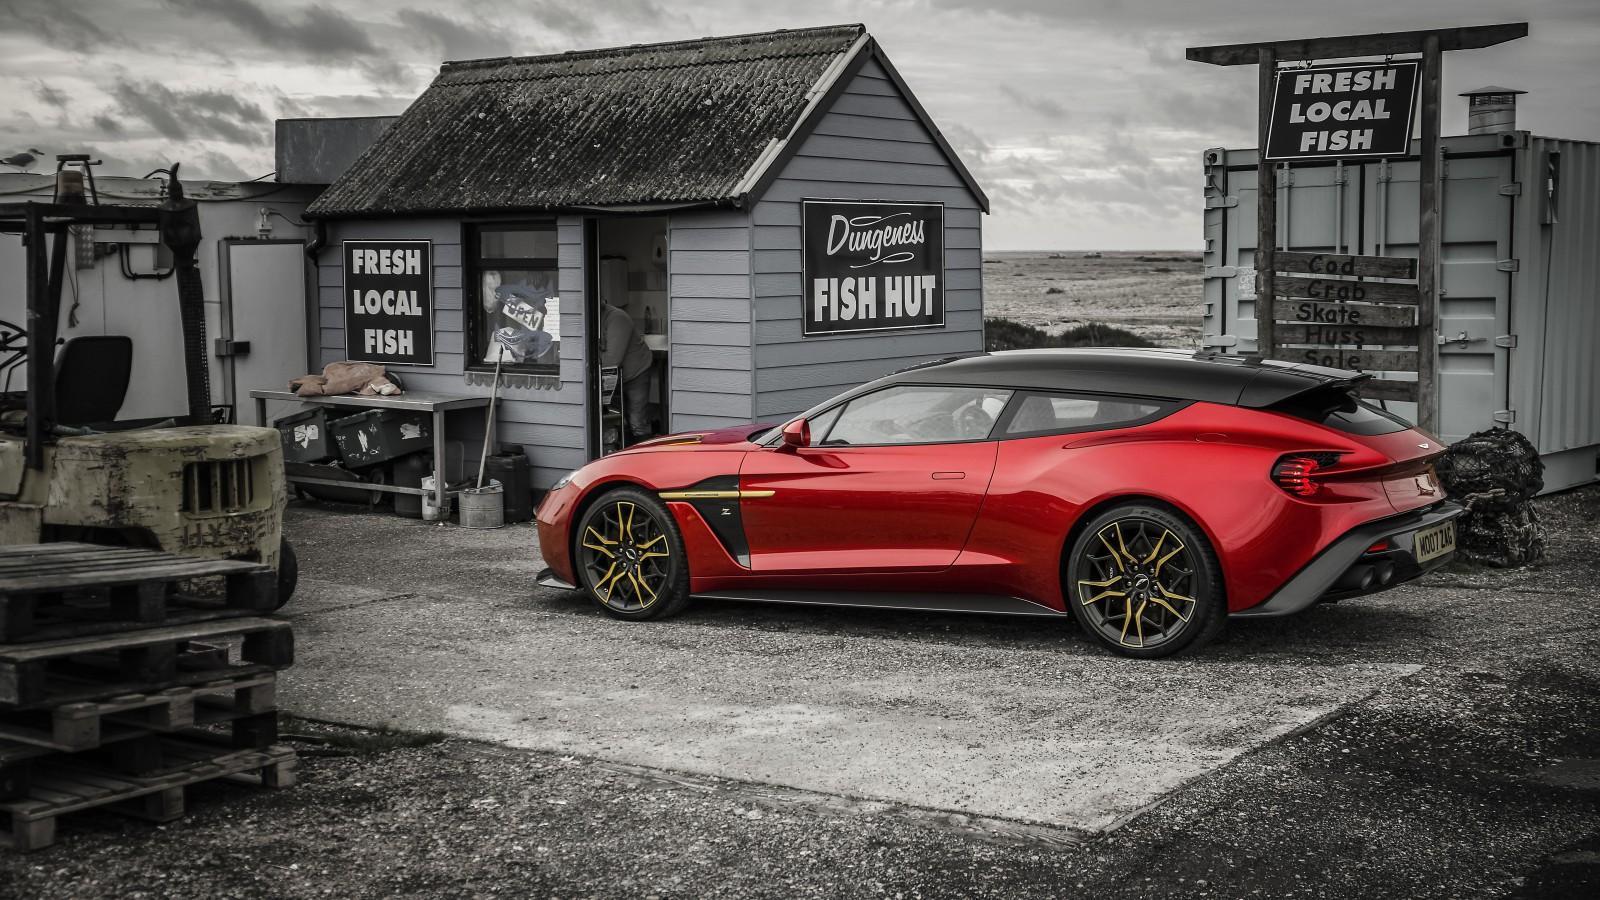 Ultra Hd Wallpapers For Iphone Aston Martin Vanquish Zagato Shooting Brake 4k 8k